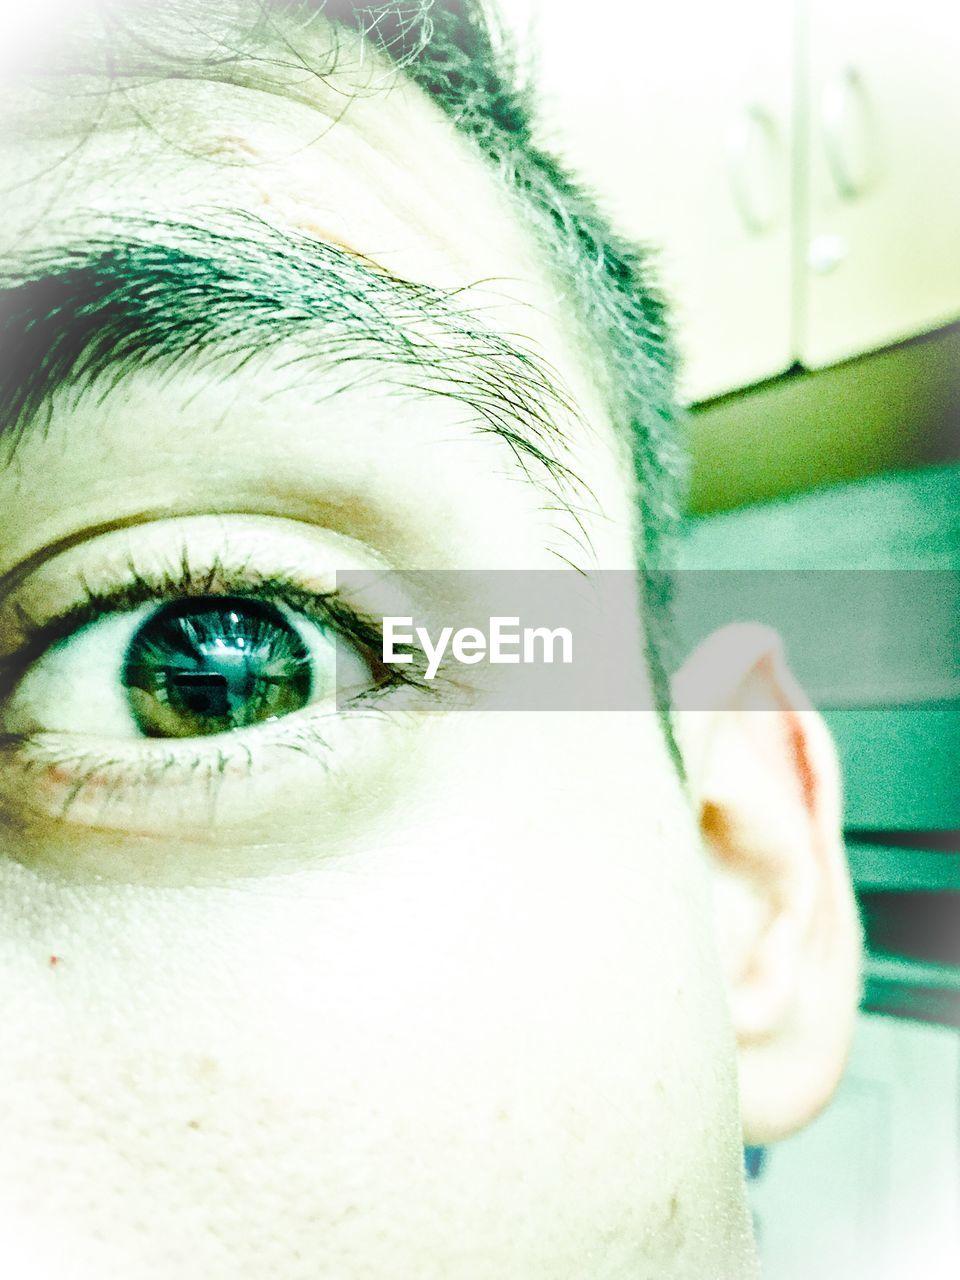 human eye, real people, one person, human body part, close-up, looking at camera, indoors, human face, day, eyeball, portrait, eyebrow, eyesight, eyelash, human hand, people